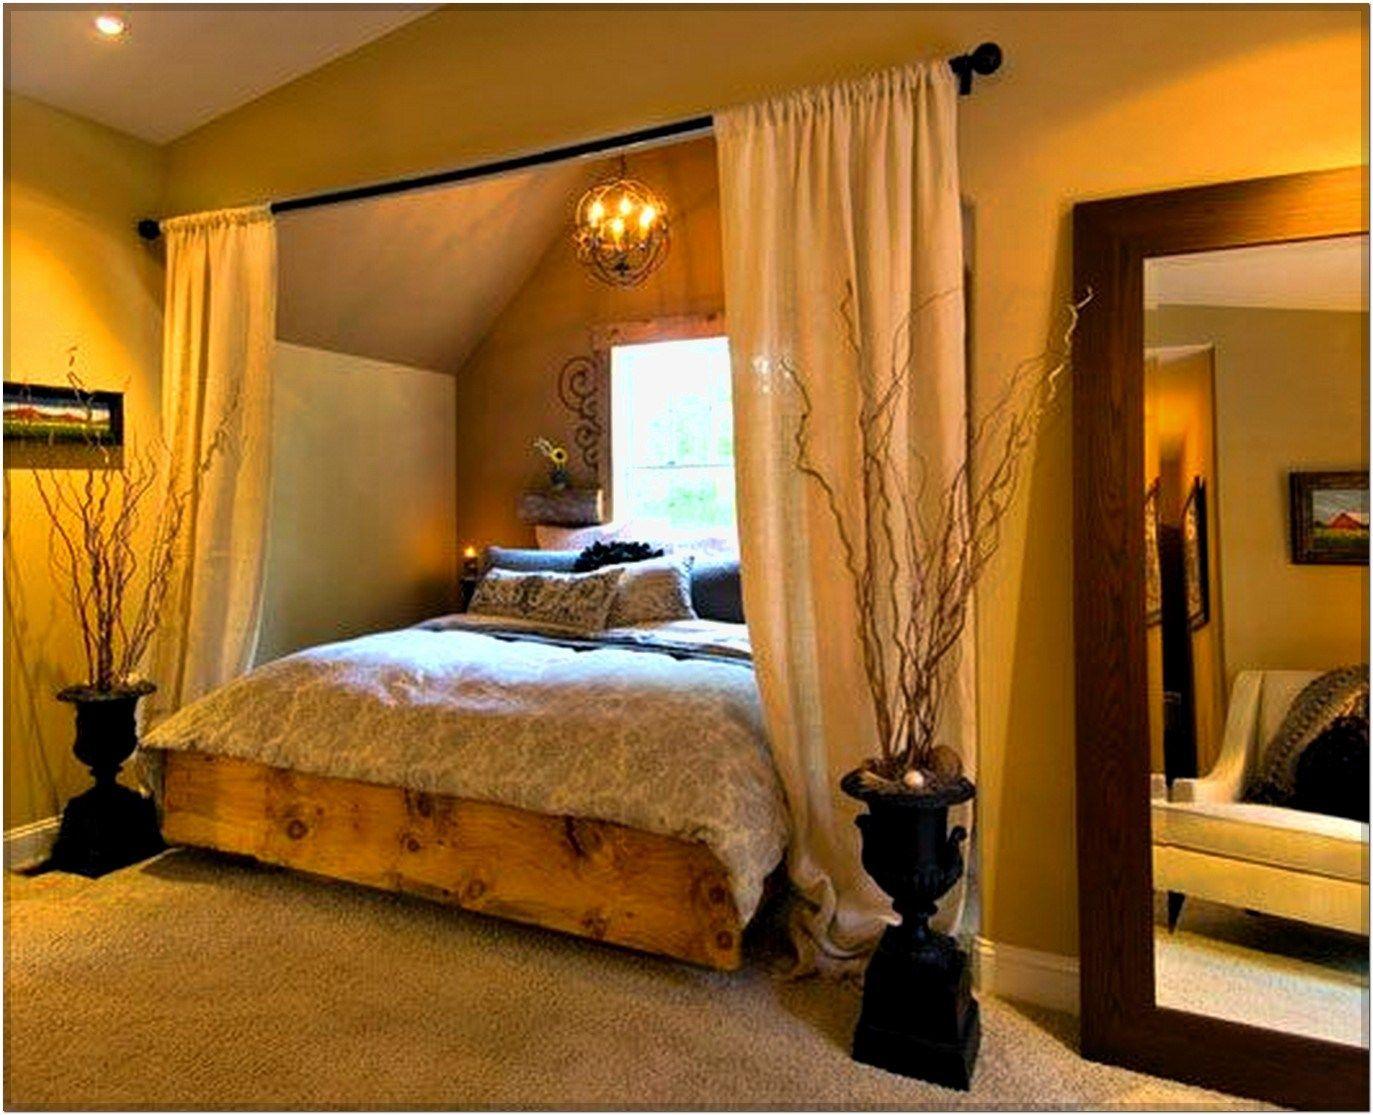 Couples Bedroom Designs Beauteous Couples Bedroom Ideas With Low Lightning  Bedroom Design Pro Design Ideas